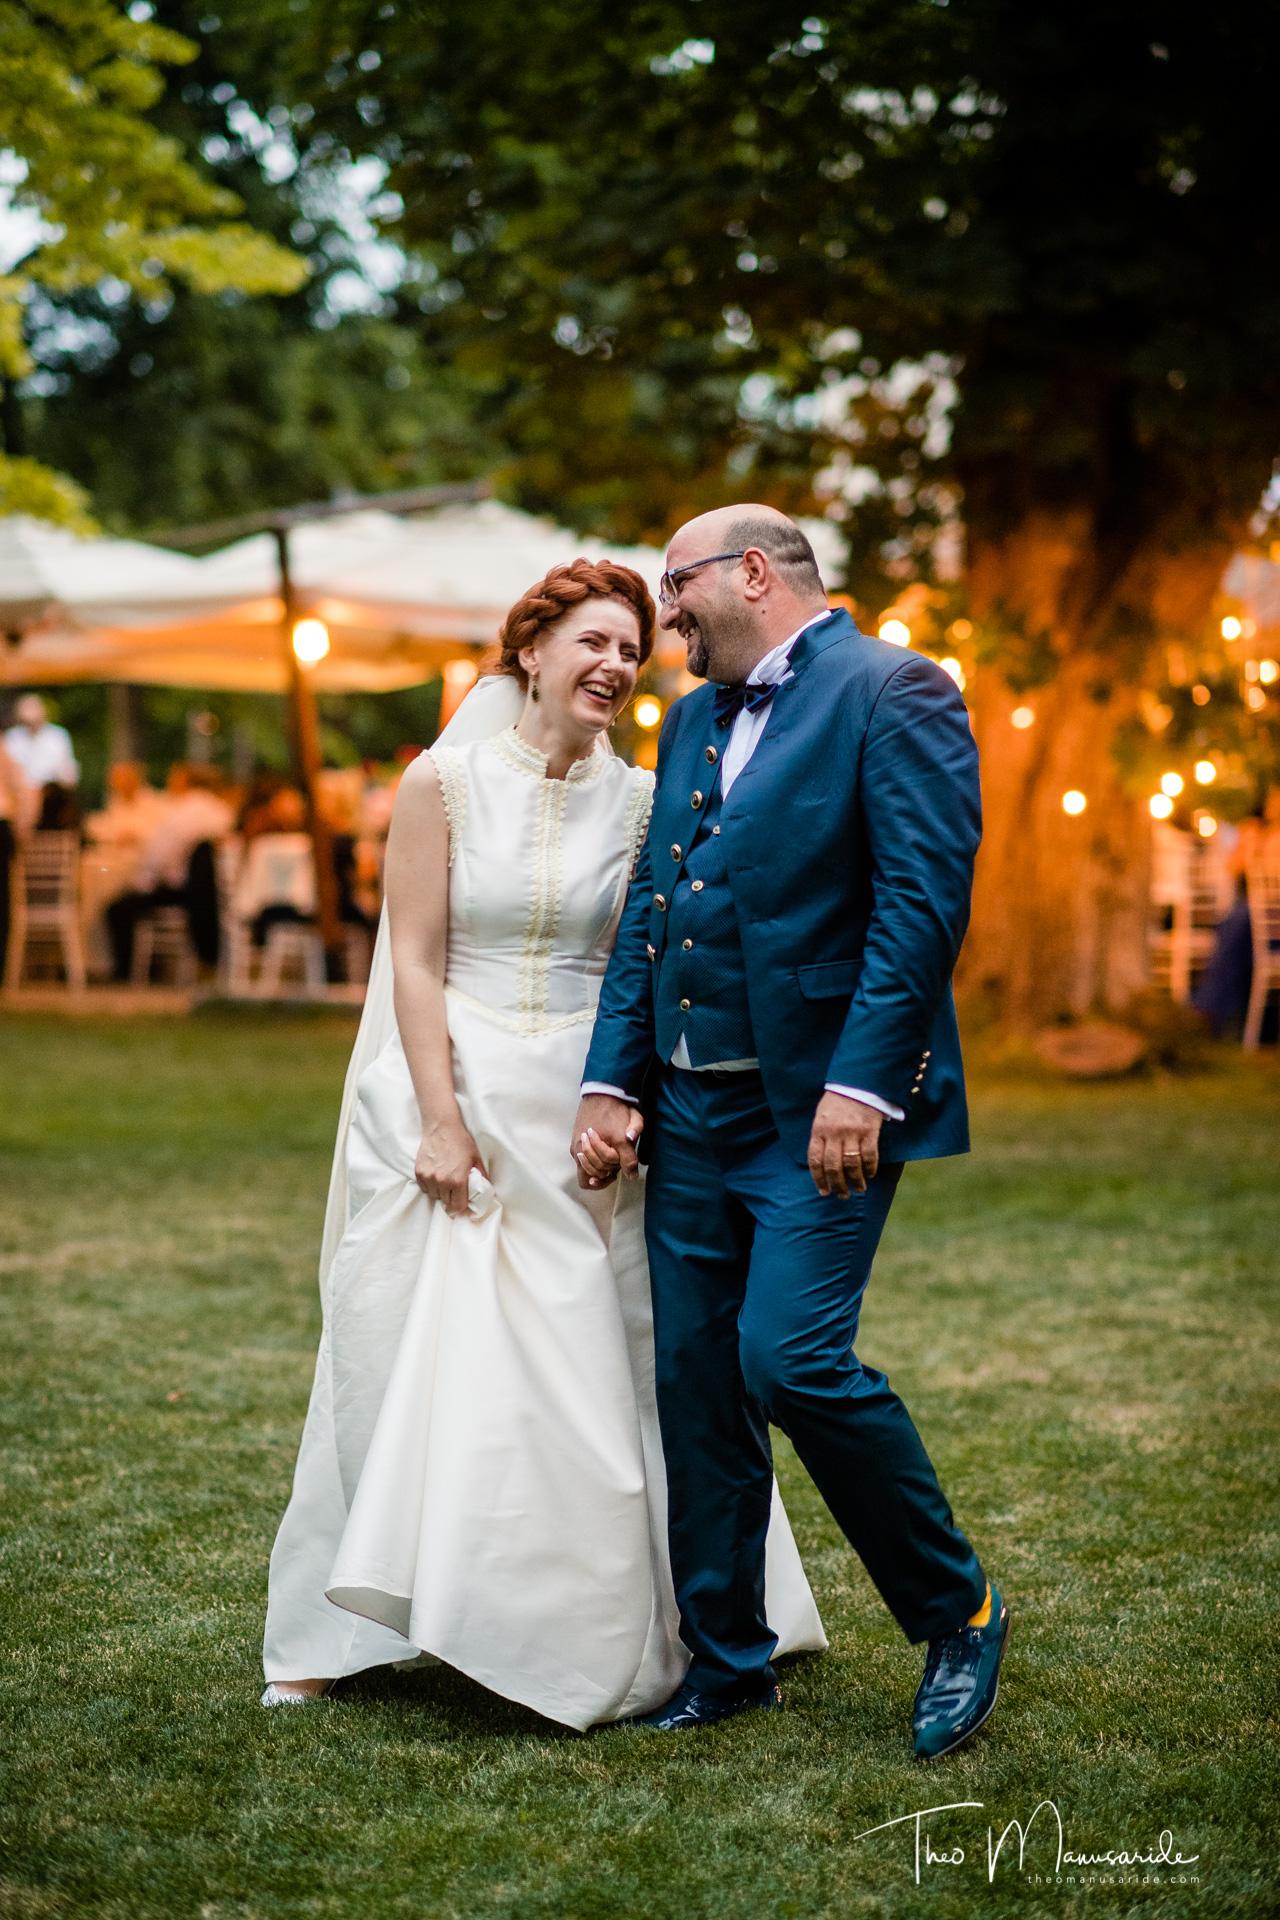 fotograf-nunta-domeniul-manasia-38